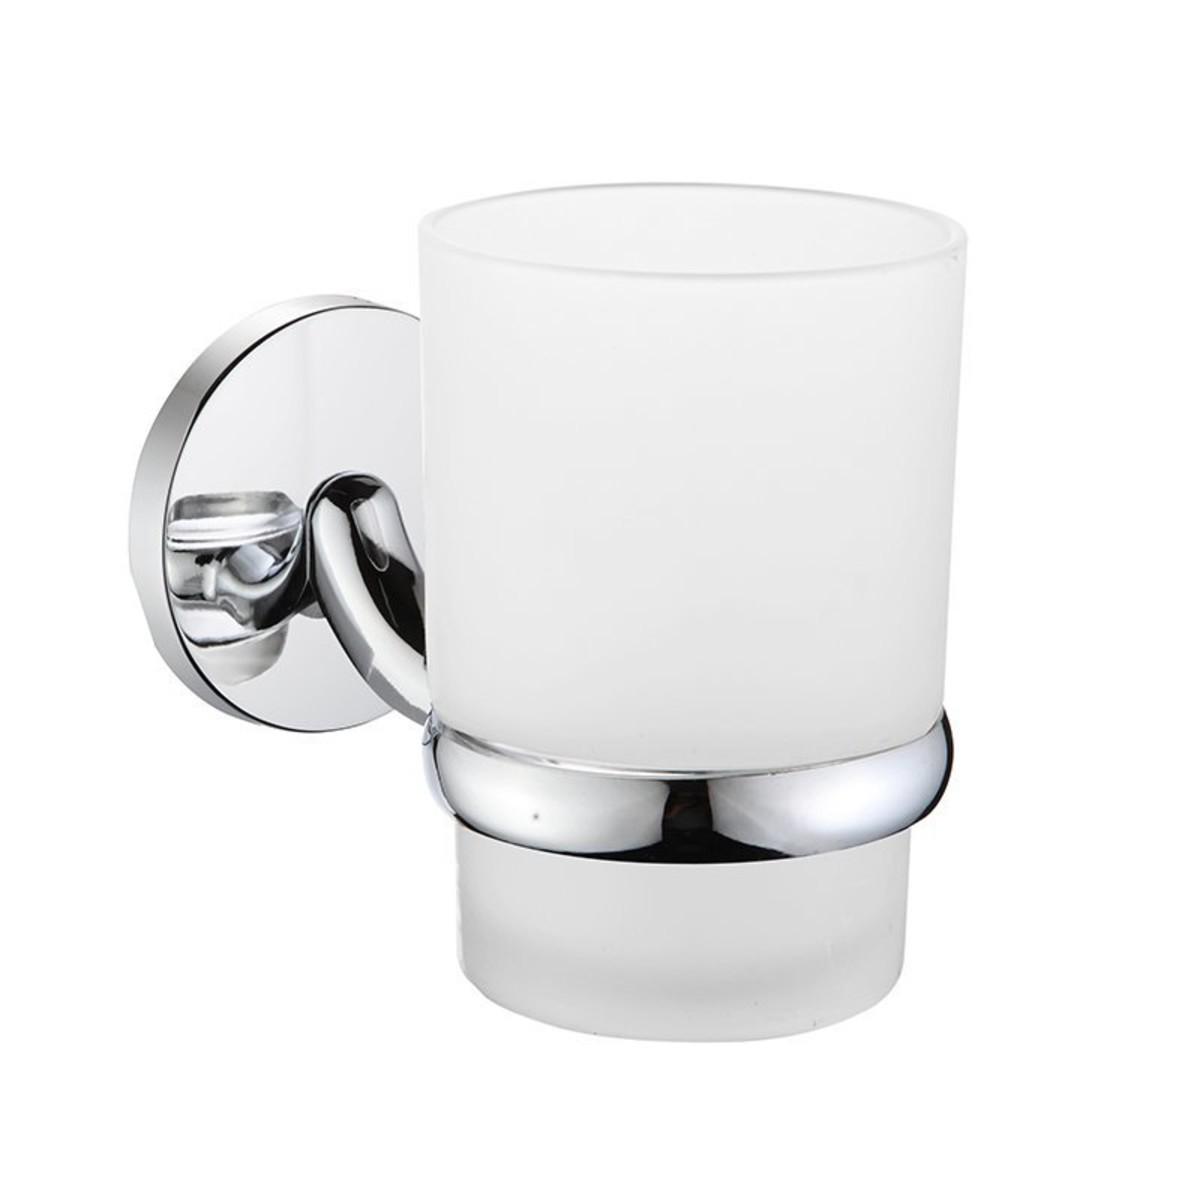 Стакан для ванной Milardo Cadiss CADSMG0M45